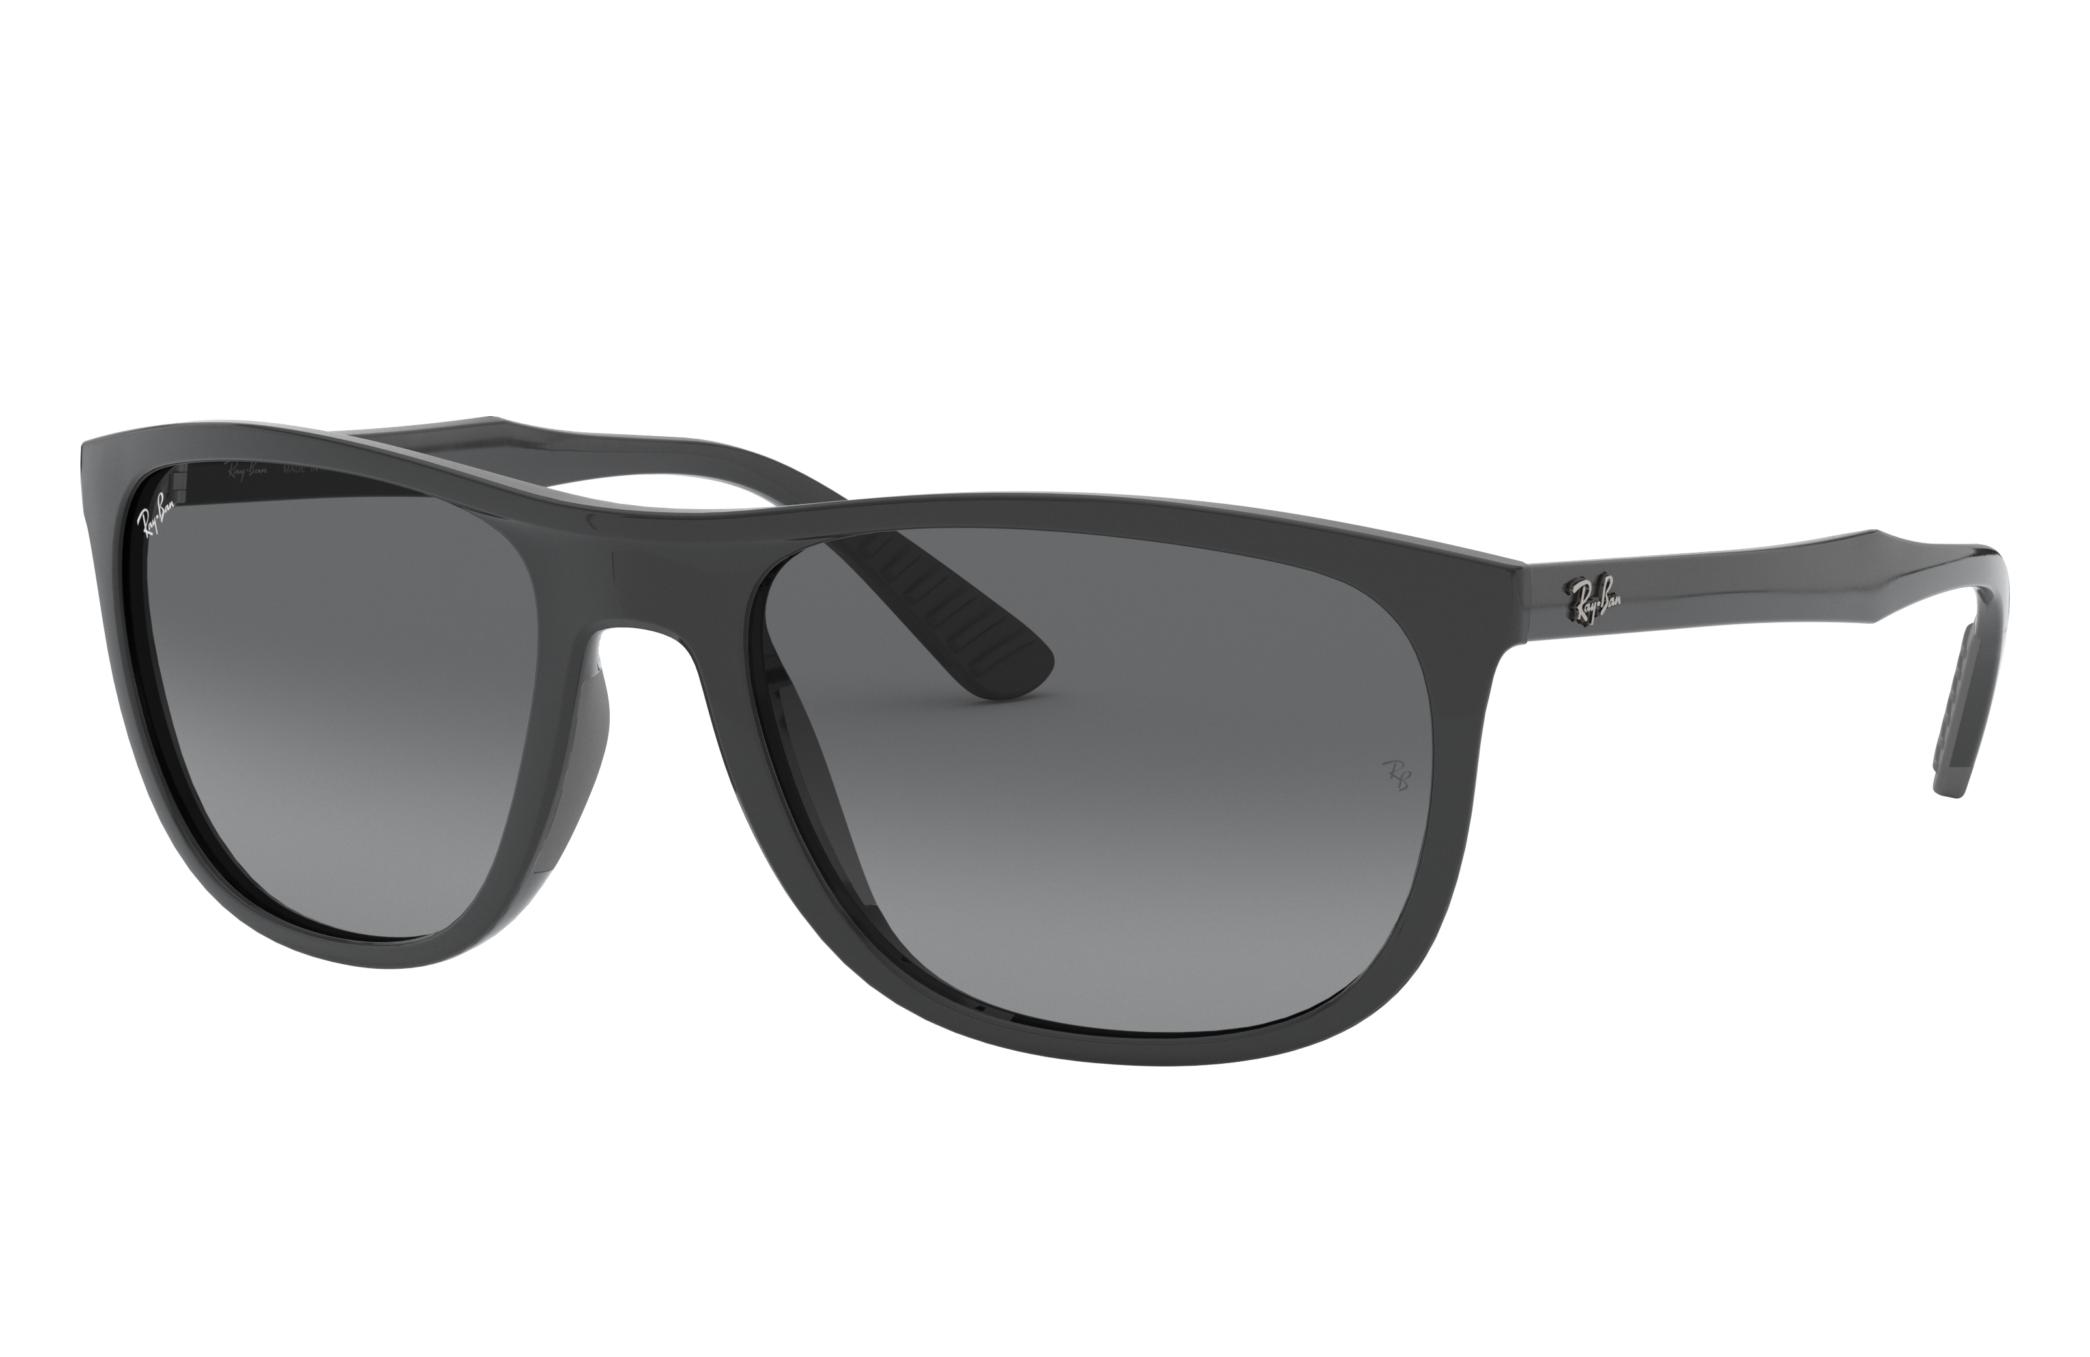 Ray-Ban Rb4291 Grey, Gray Lenses - RB4291